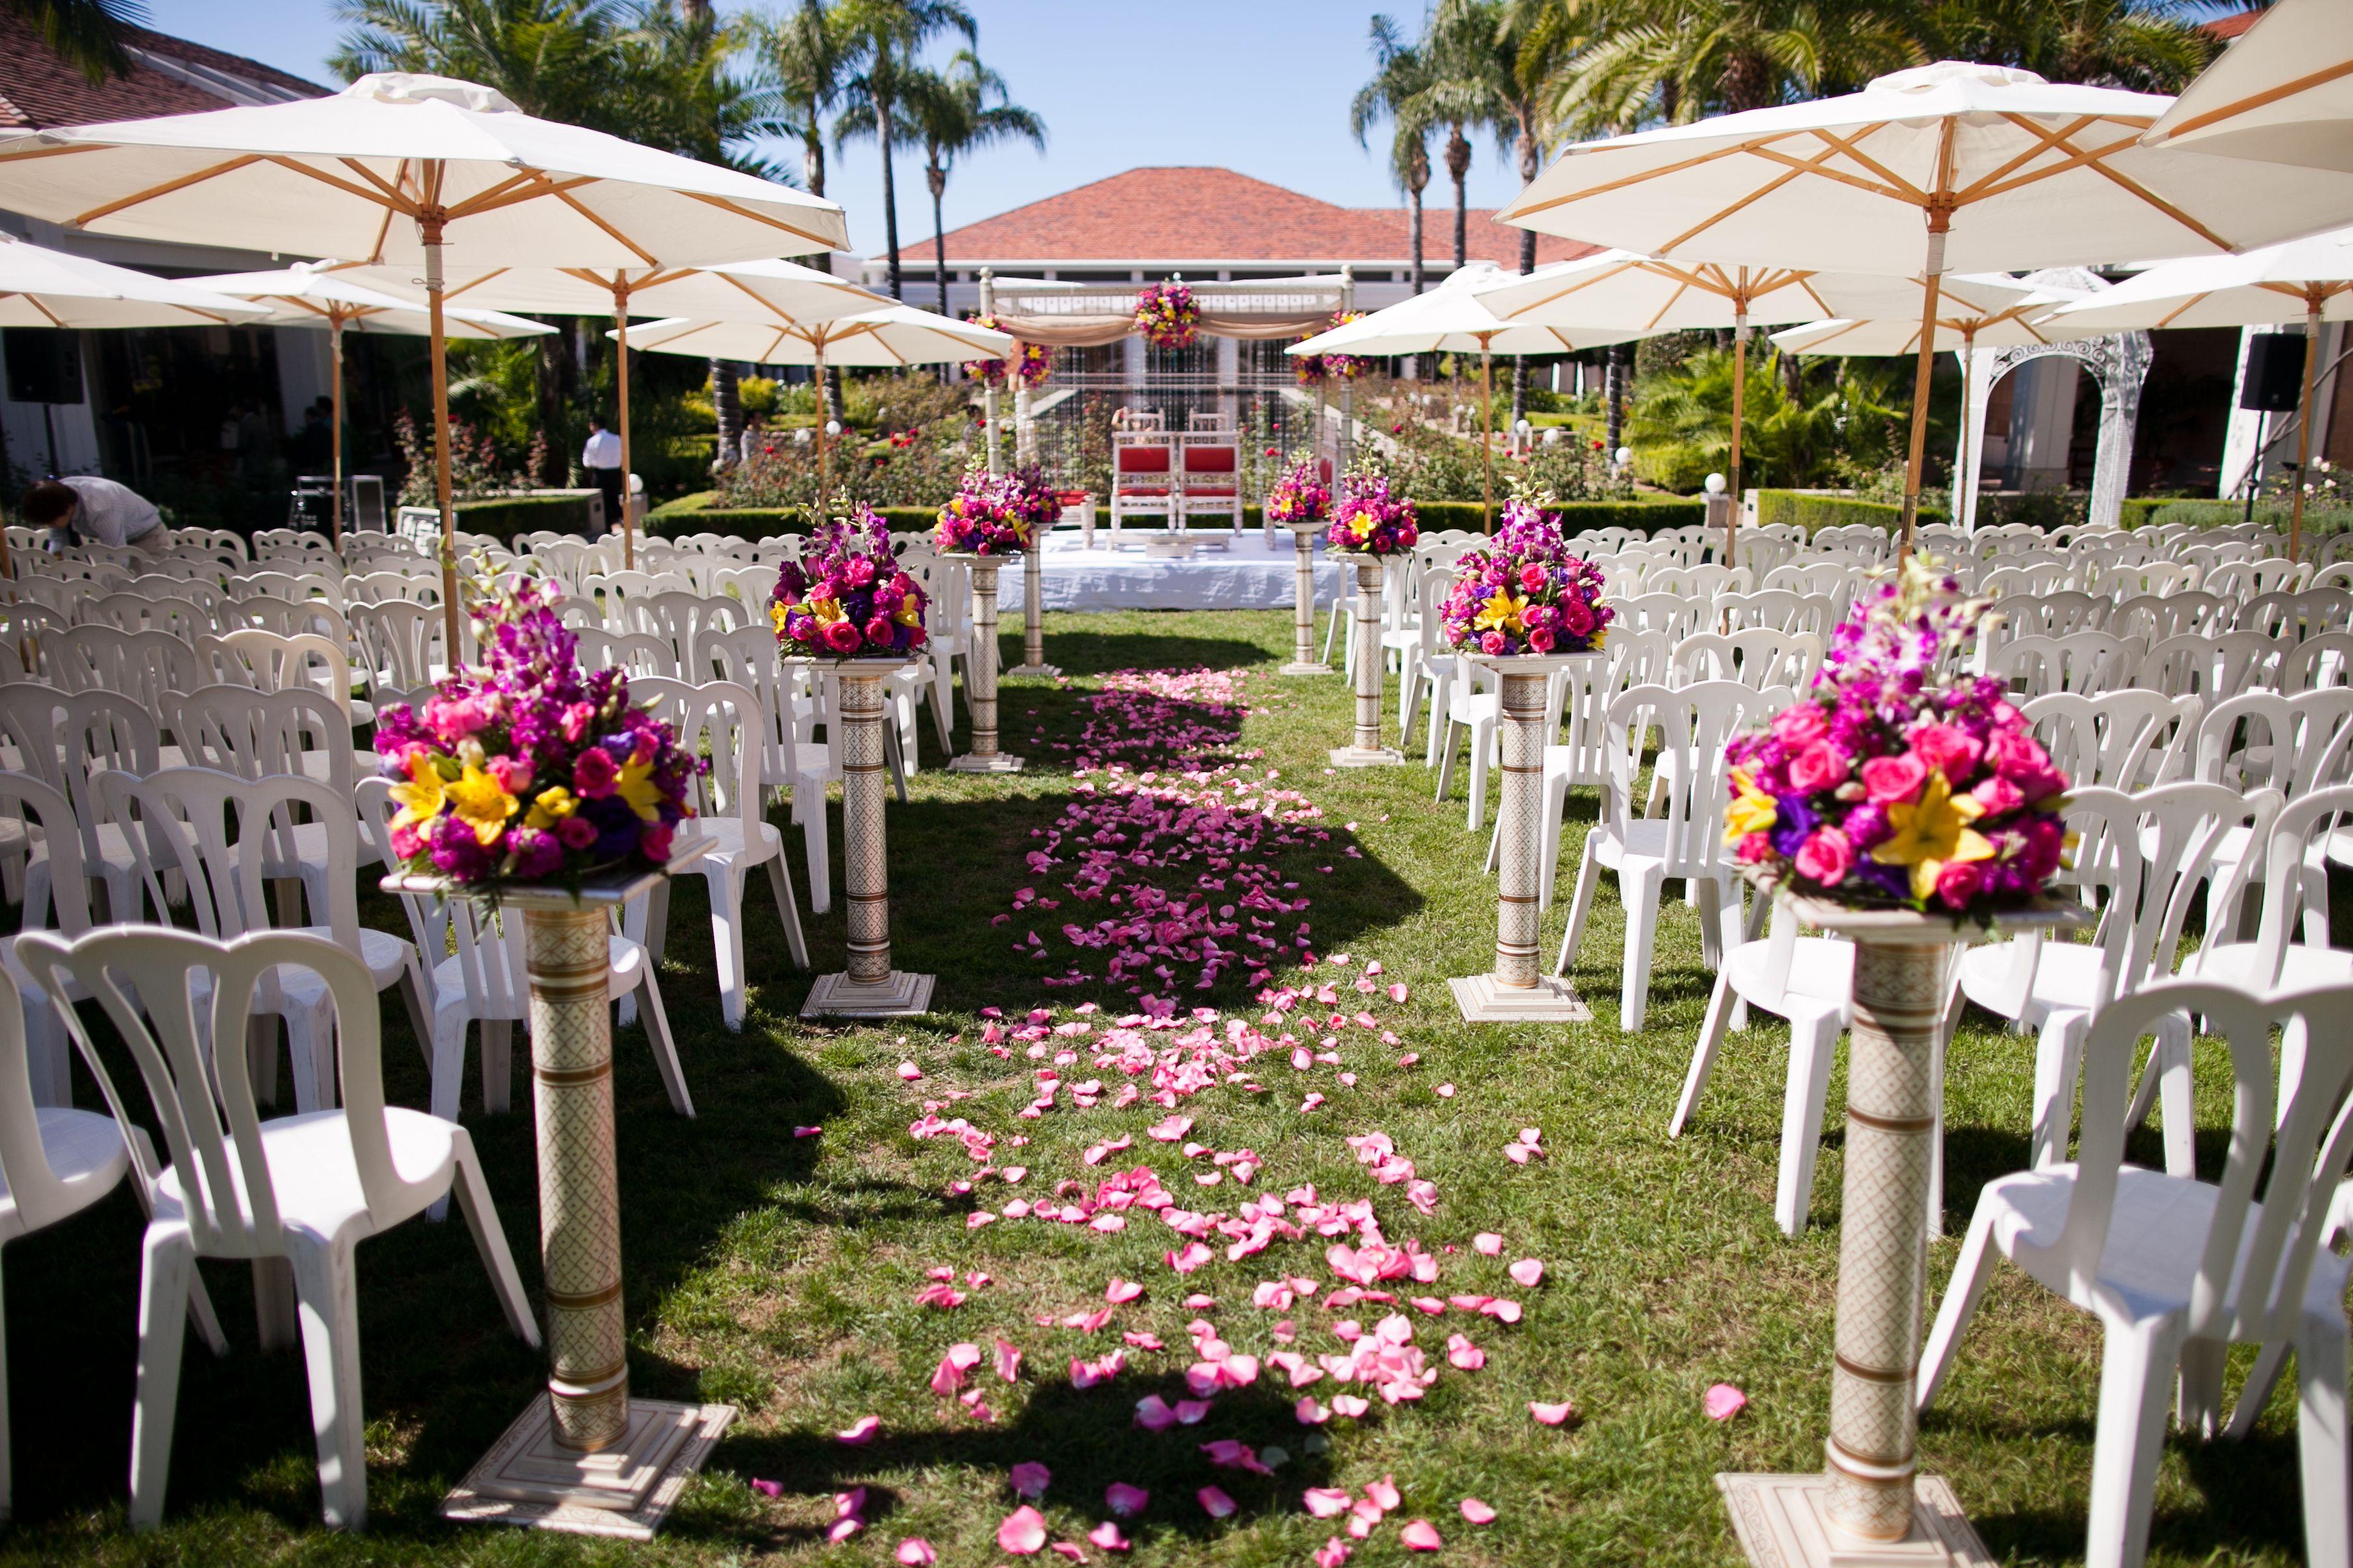 Rose petals leading the aisle to the mandap #nixonlibrary #wedding #weddingvenue #mandapideas  #indianceremony #socalwedding http://specialevents.nixonfoundation.org/weddings/